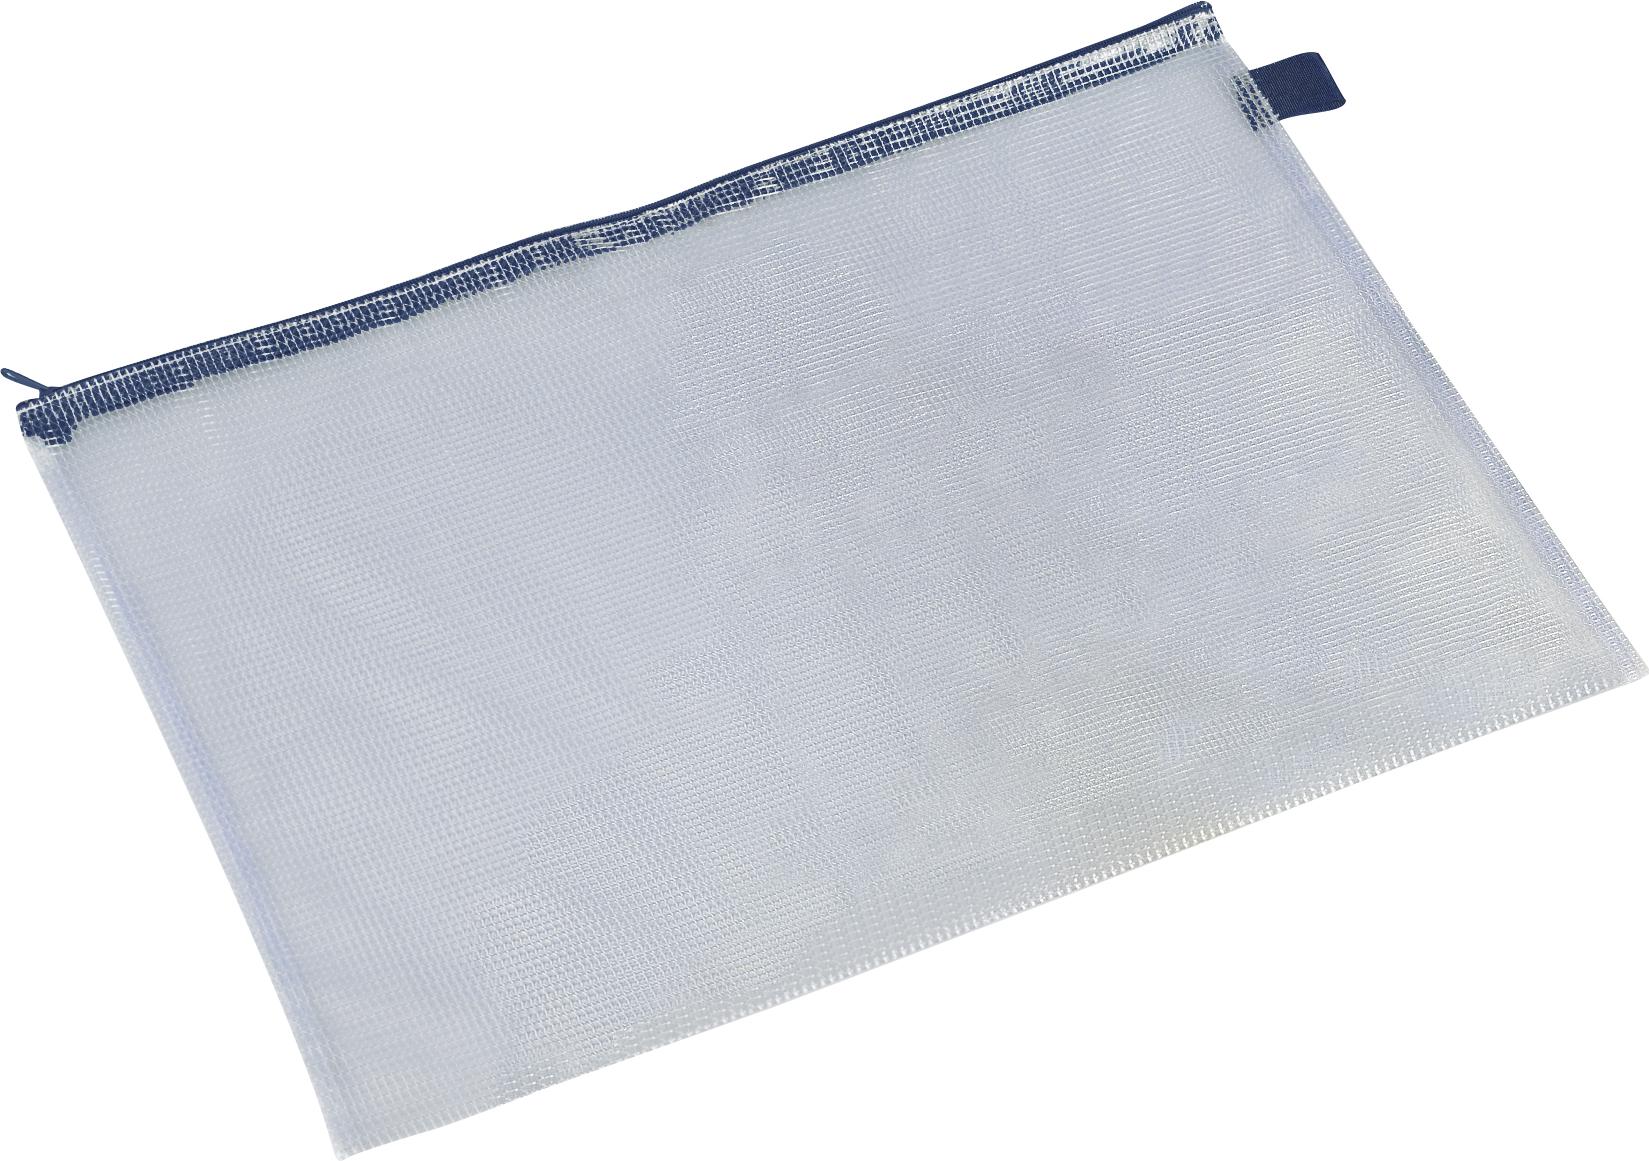 Blau/transparente Schönherr Reißverschlusstasche DIN A3 aus gewebeverstärkter PVC-Folie